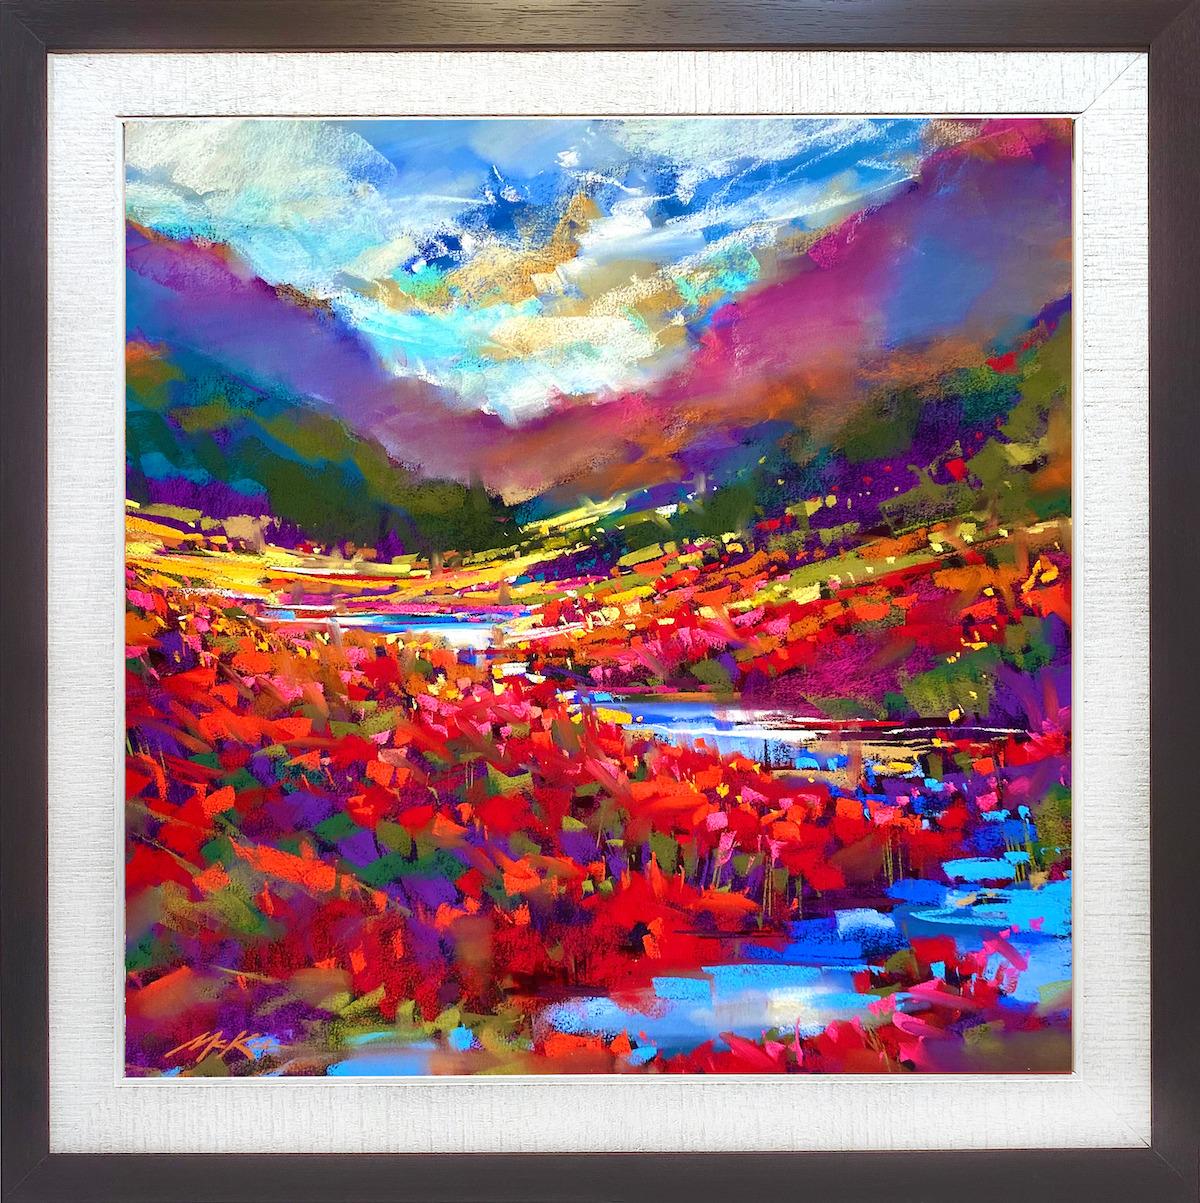 Scarlet valley 27x27 cappuccino frame 1 copy jcblqr